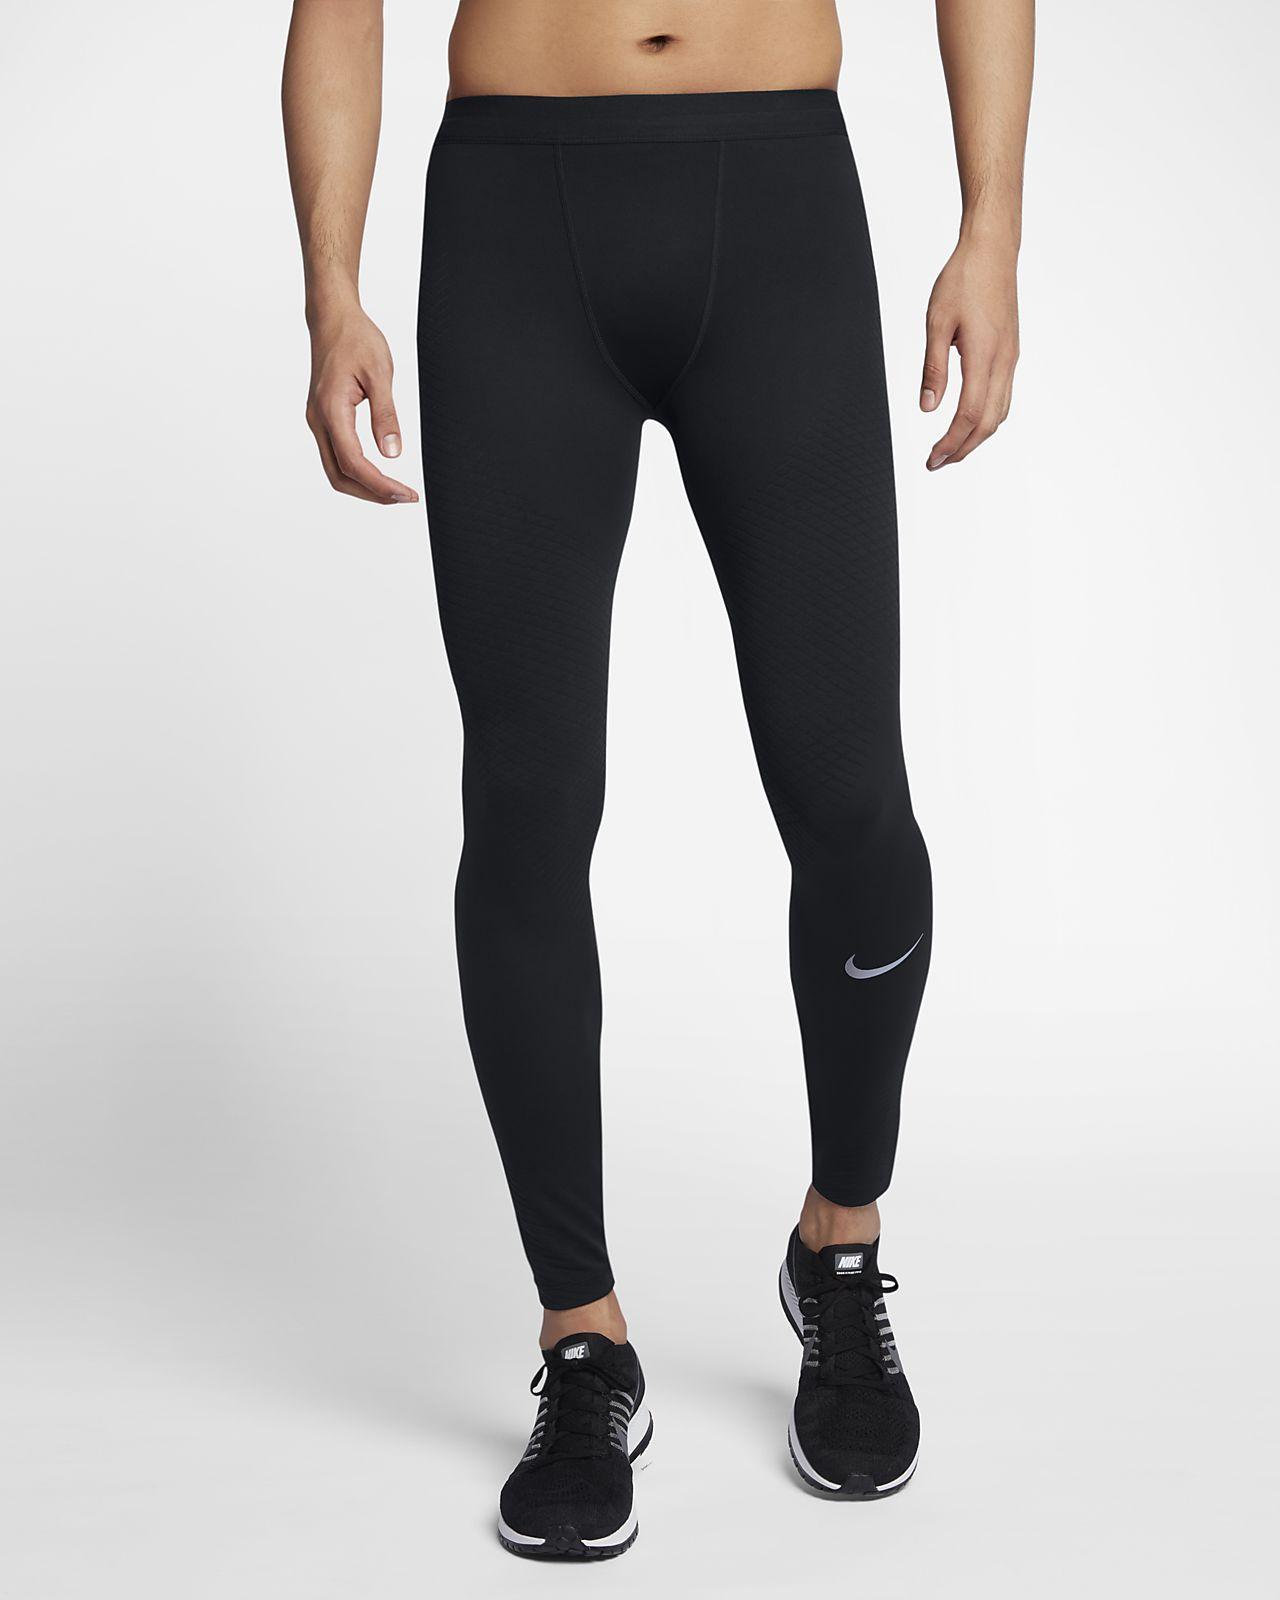 Nike running leggings mens